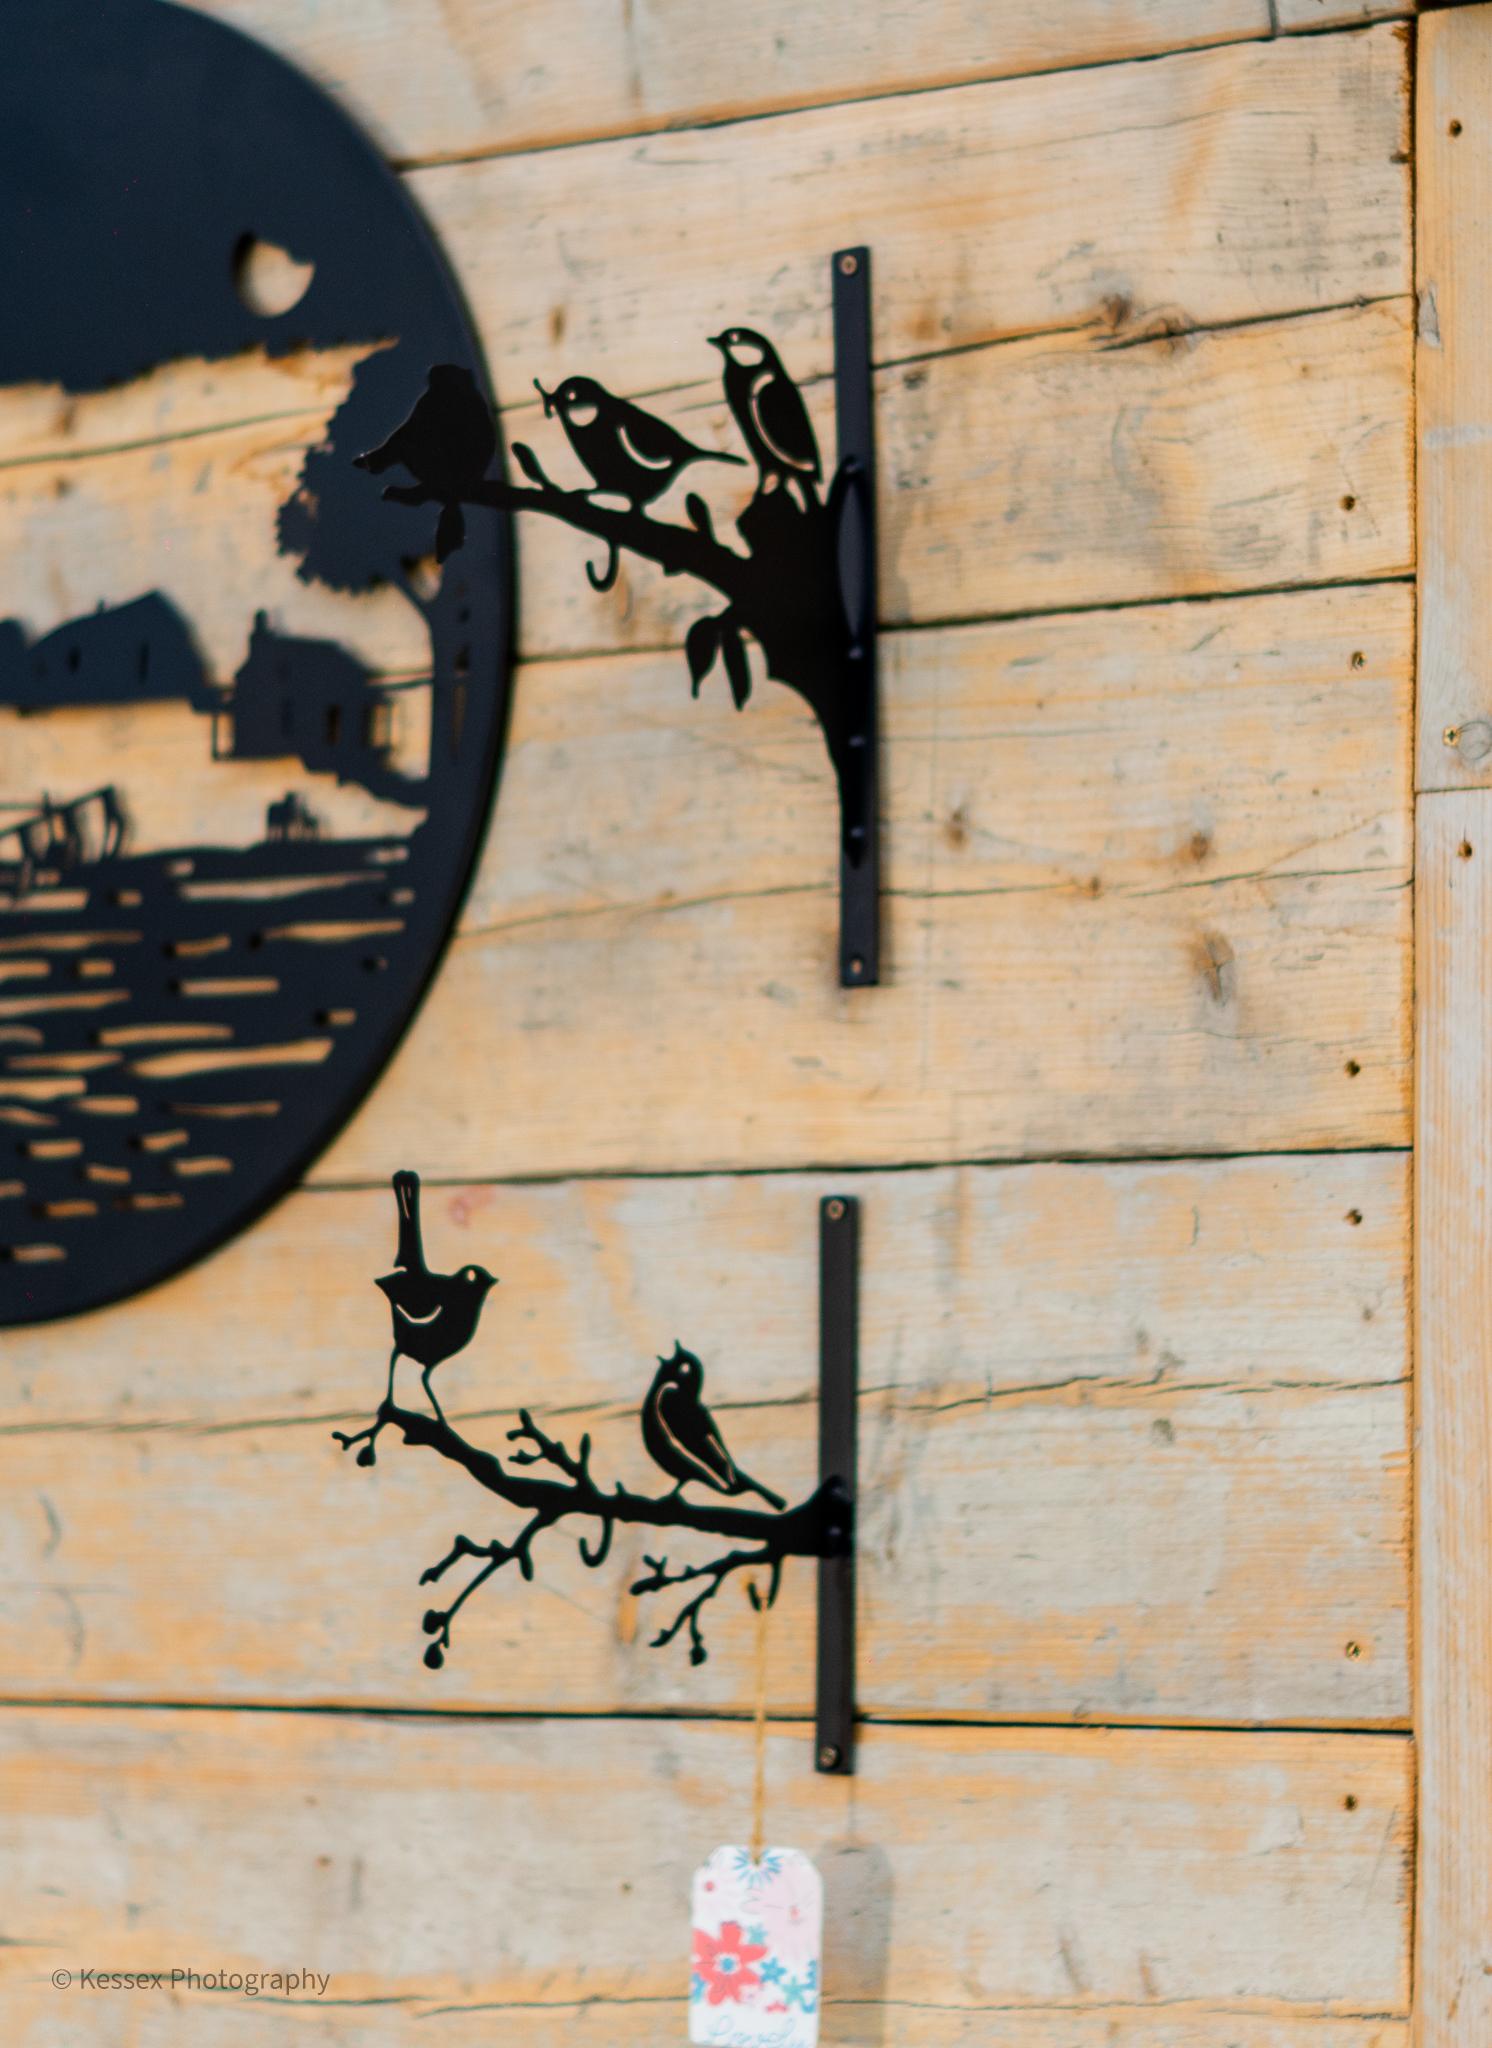 BIRD FEEDING HOOKS